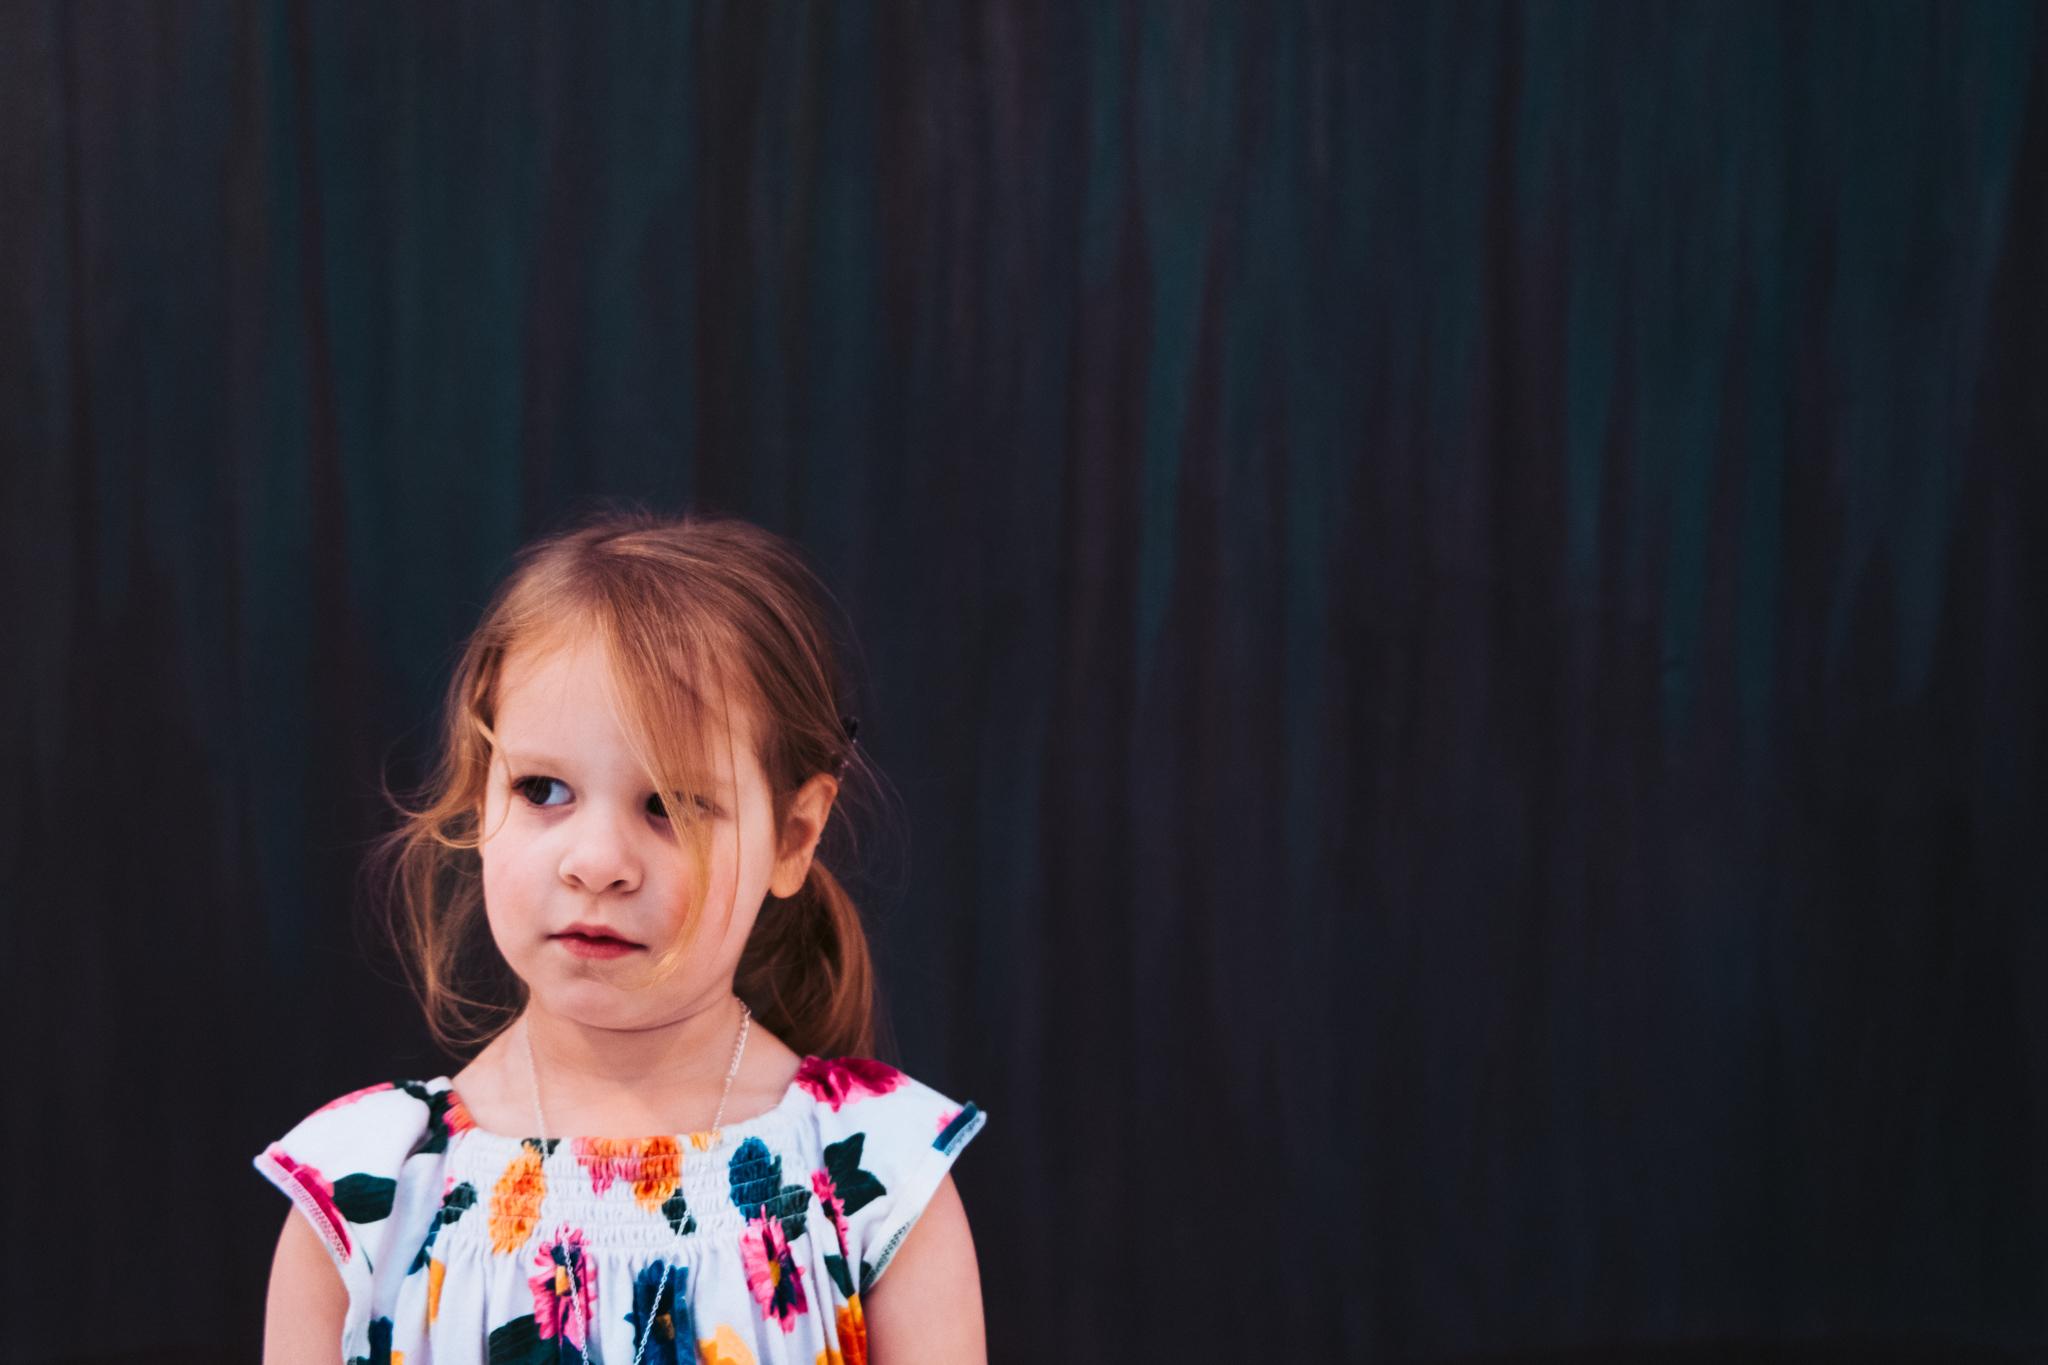 portrait of child at art museum